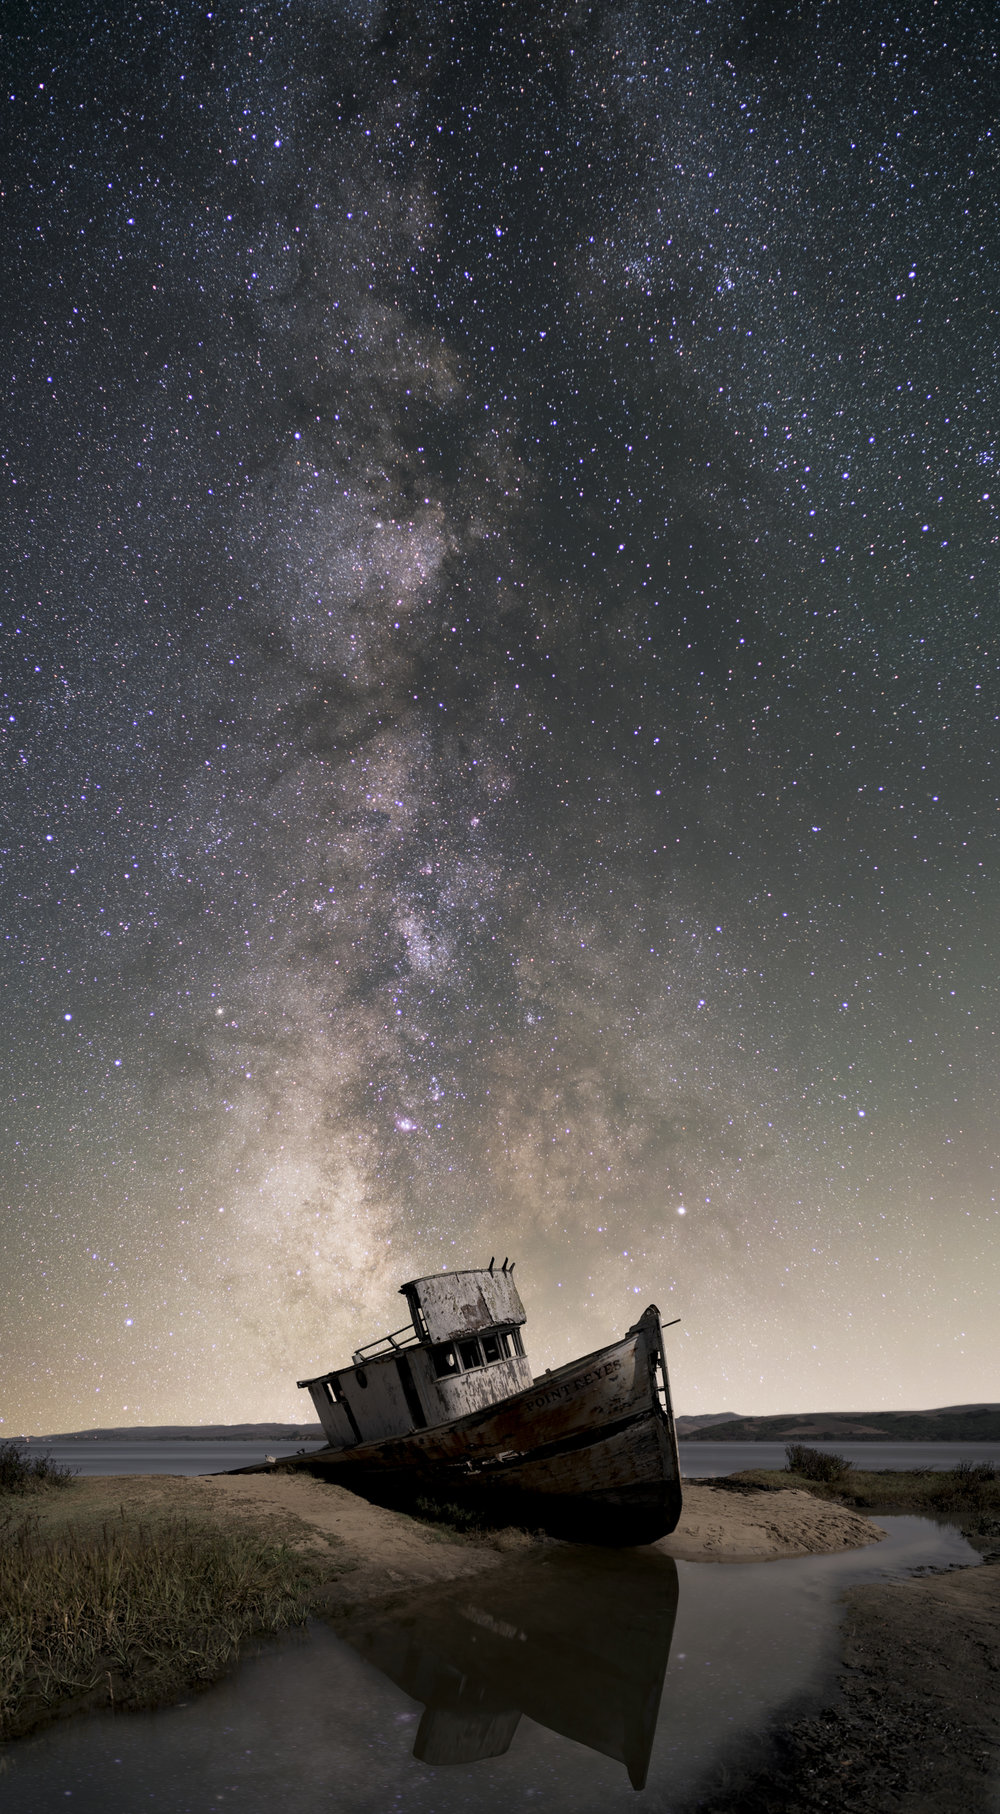 Point Reyes Shipwreck, California